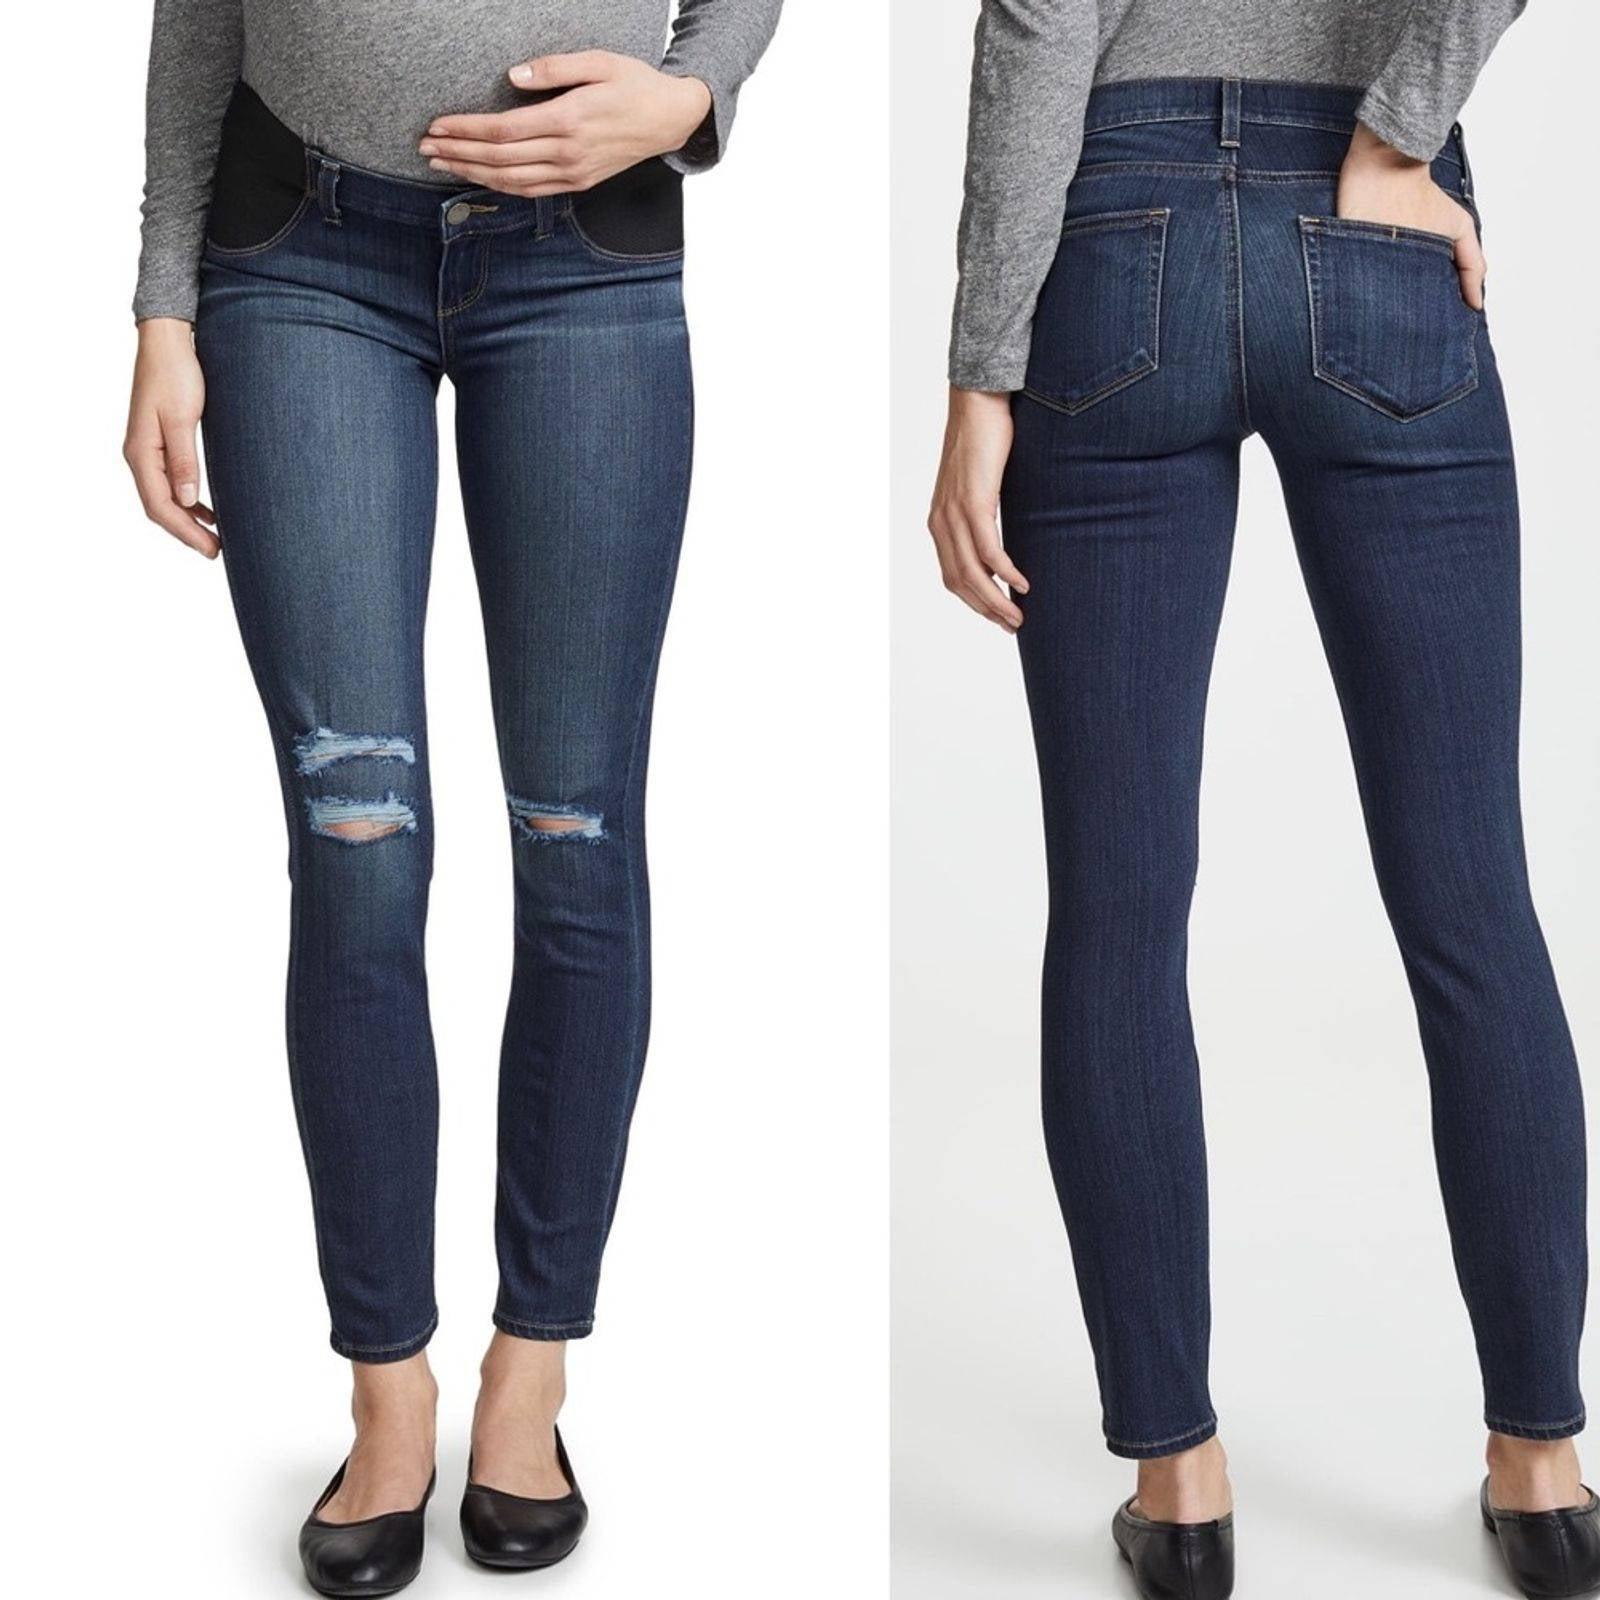 PAIGE Maternity Verdugo Skinny Jeans 29